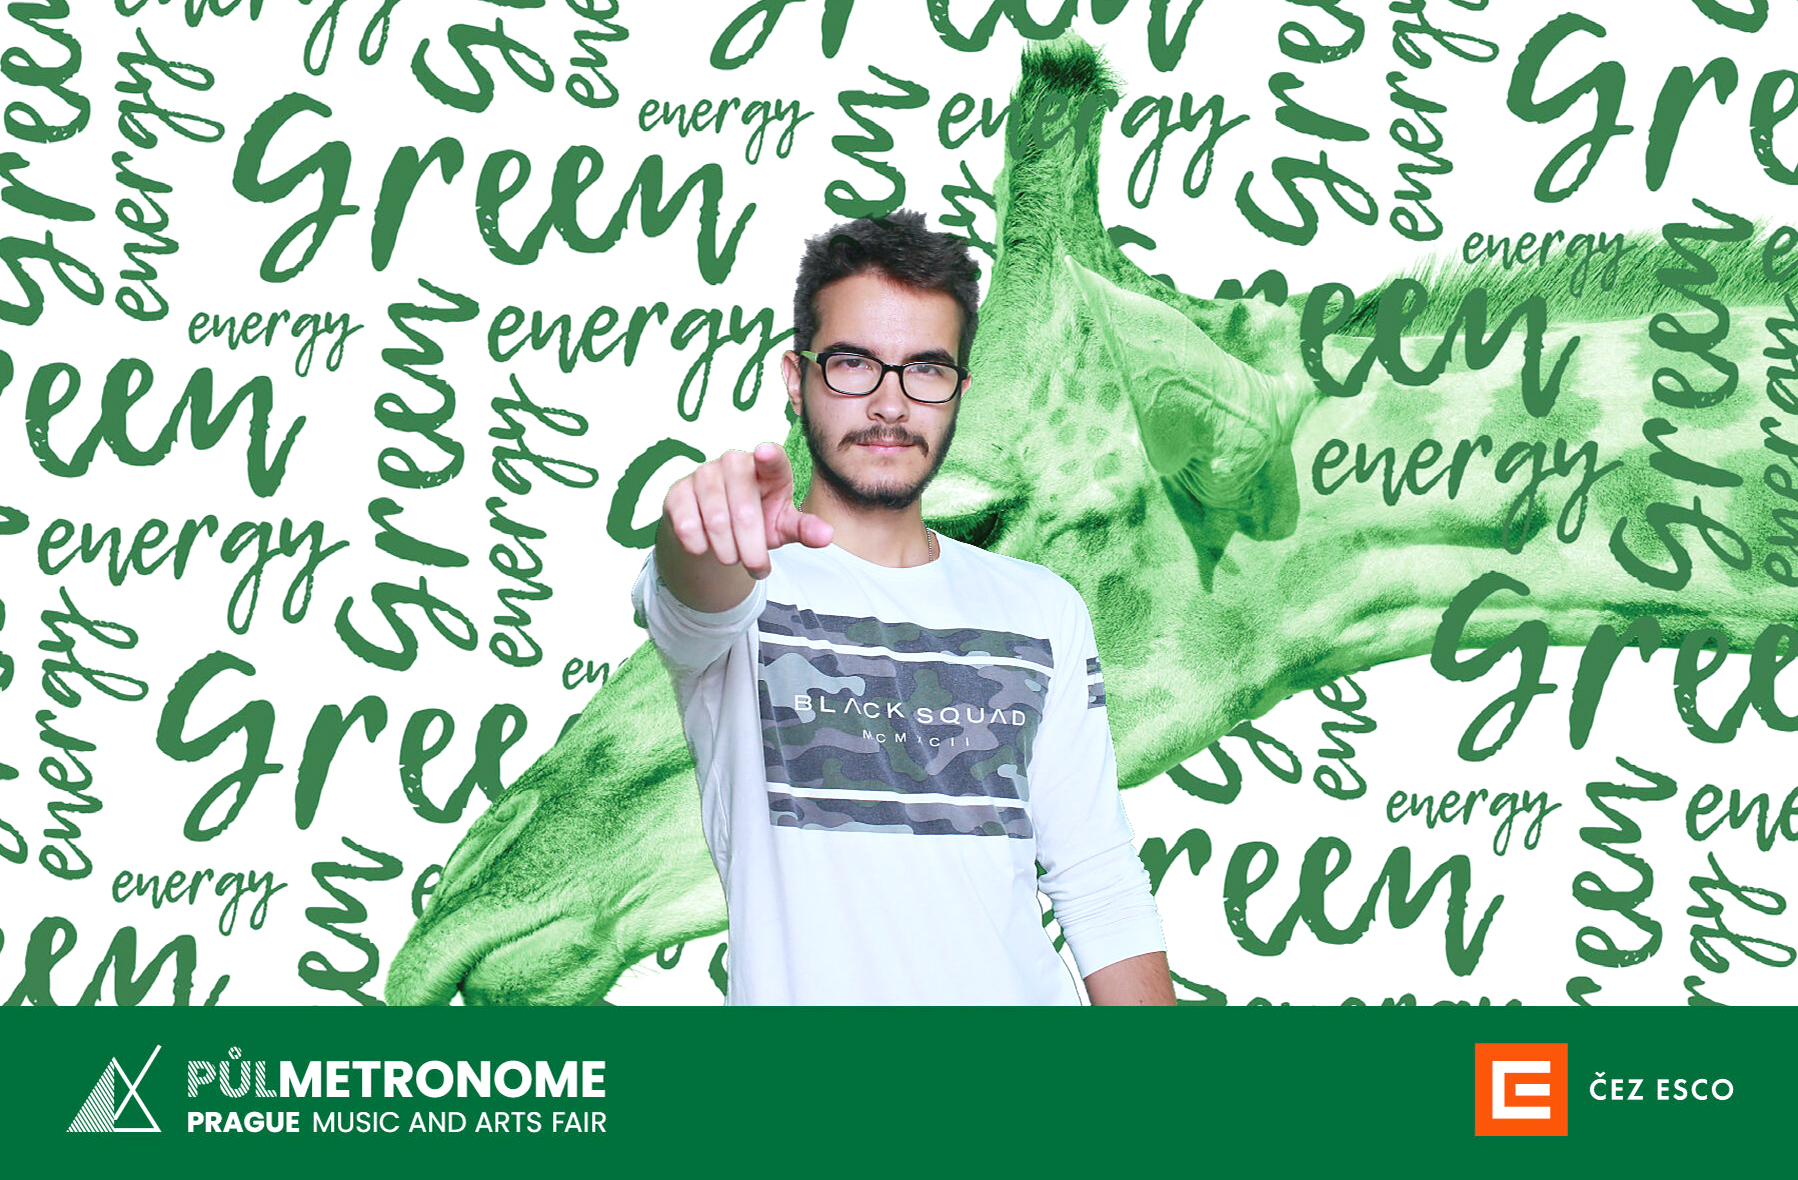 fotokoutek-festival-praha-cez-esco-pulmetronome-19-9-2020-731024